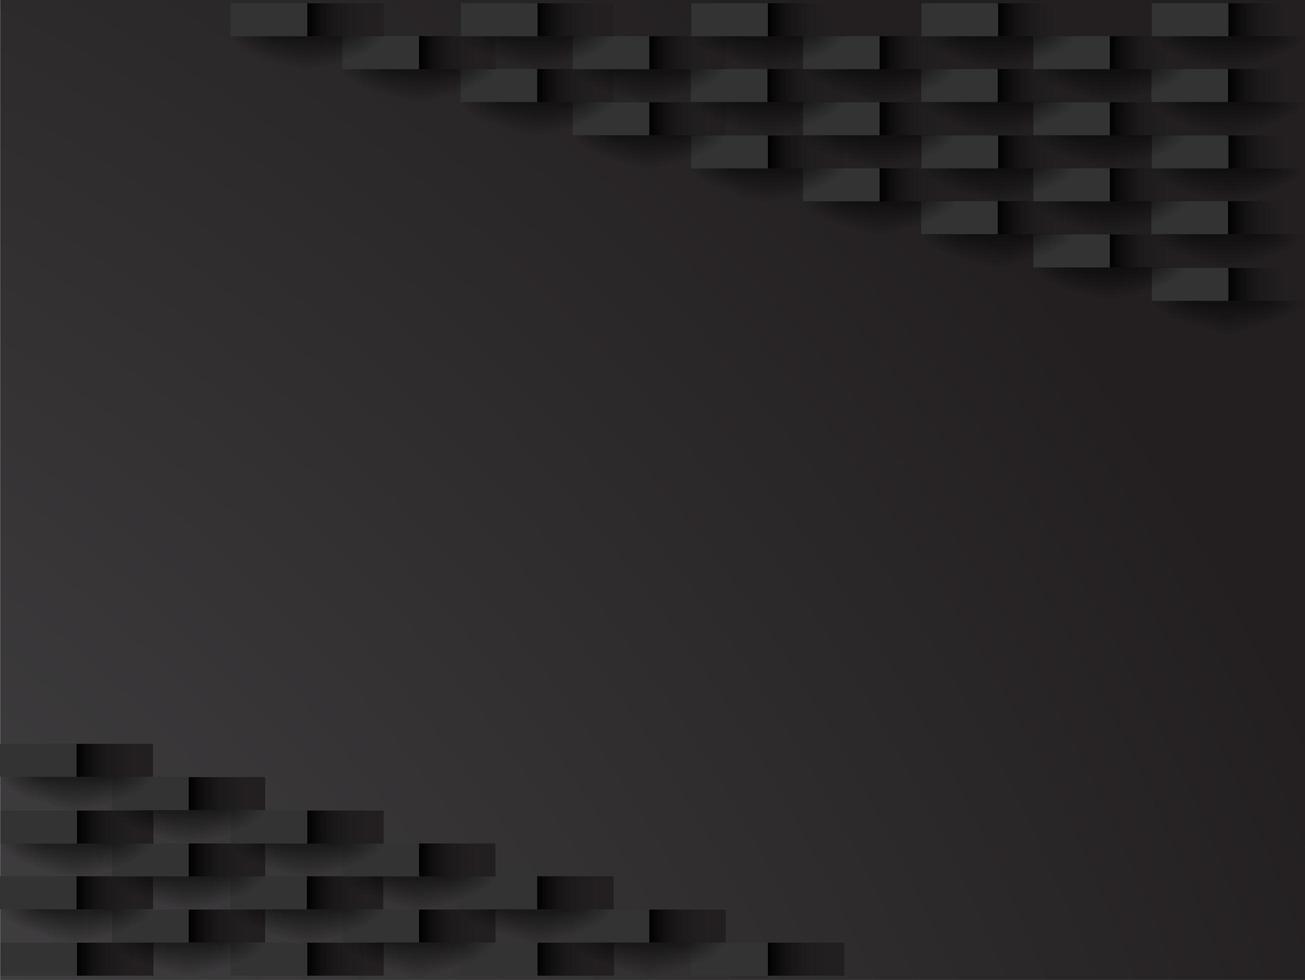 Diagonale zwarte achtergrond vector